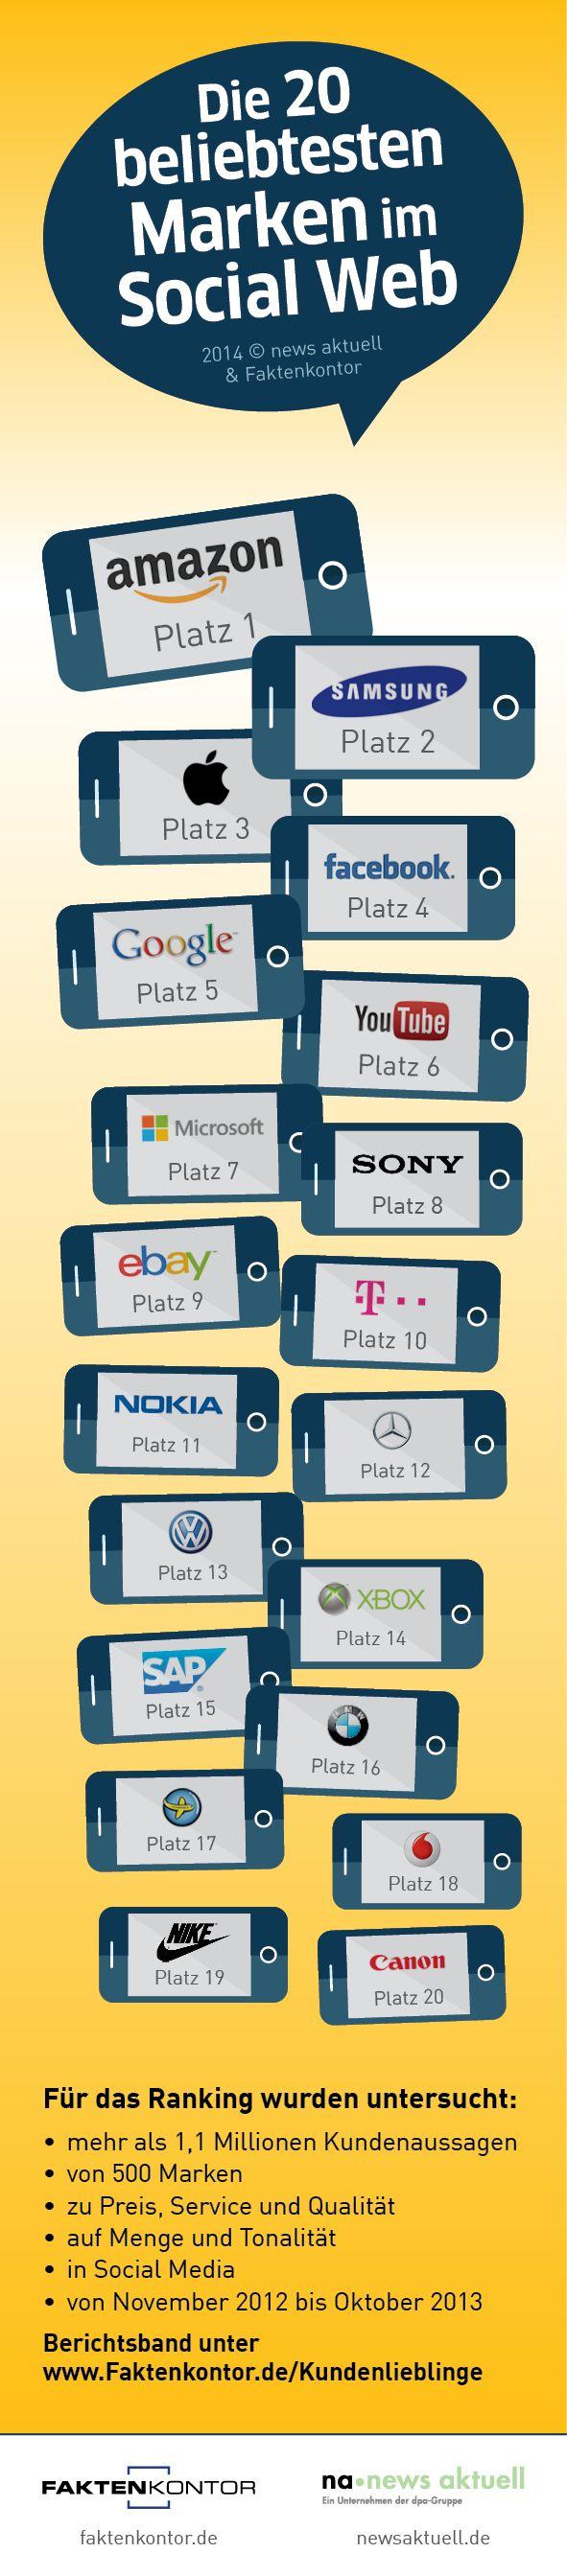 Amazon vor Samsung und Apple: Die 20 beliebtesten Marken in Social Media | Kroker's Look @ IT